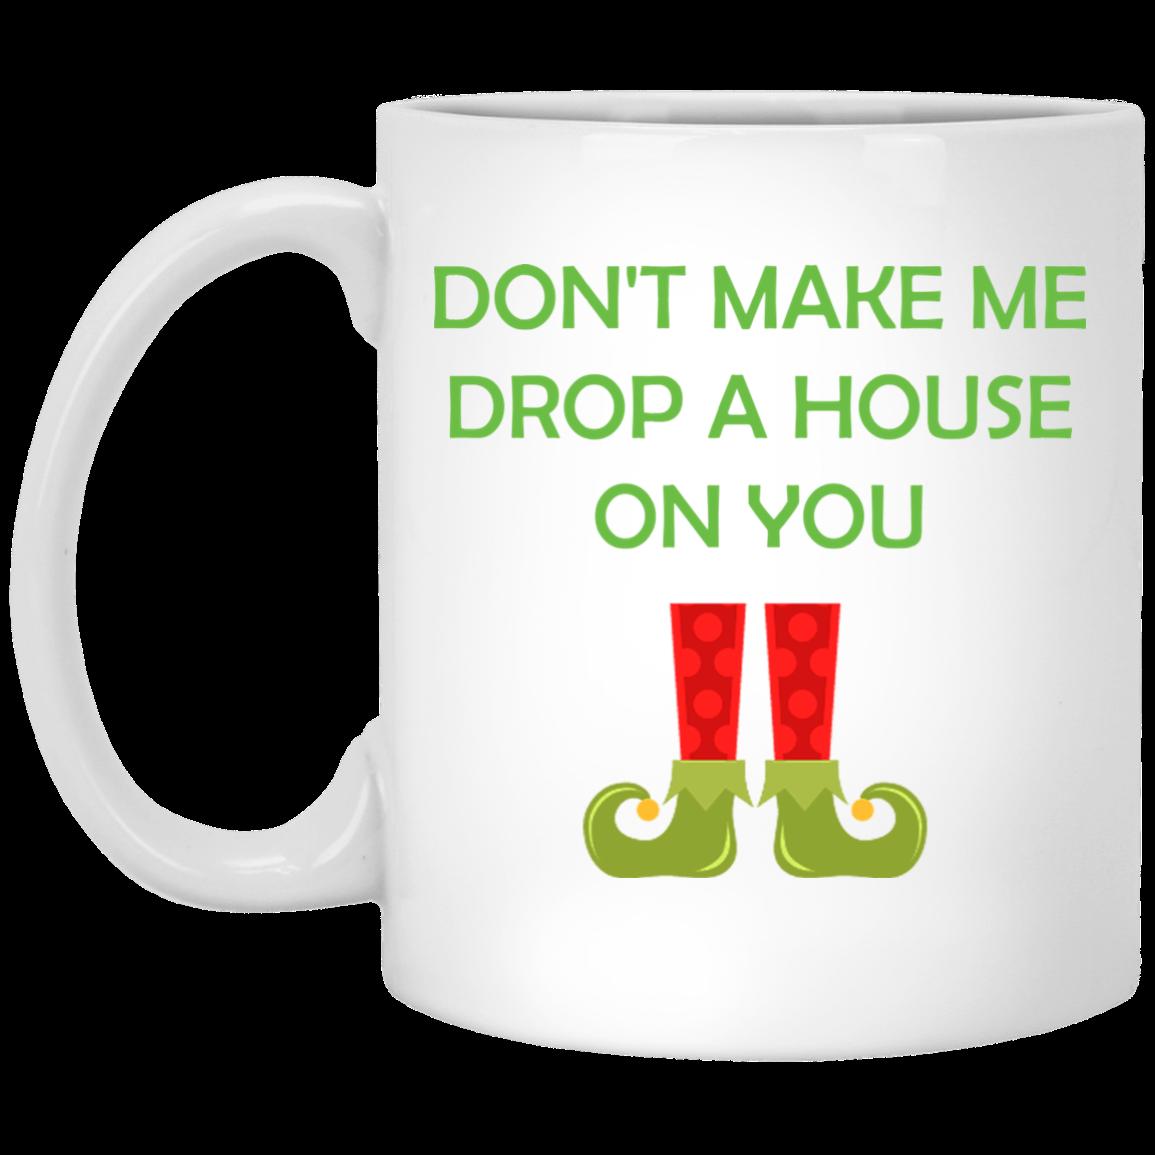 image 20 - Don't make me drop a house on you mug